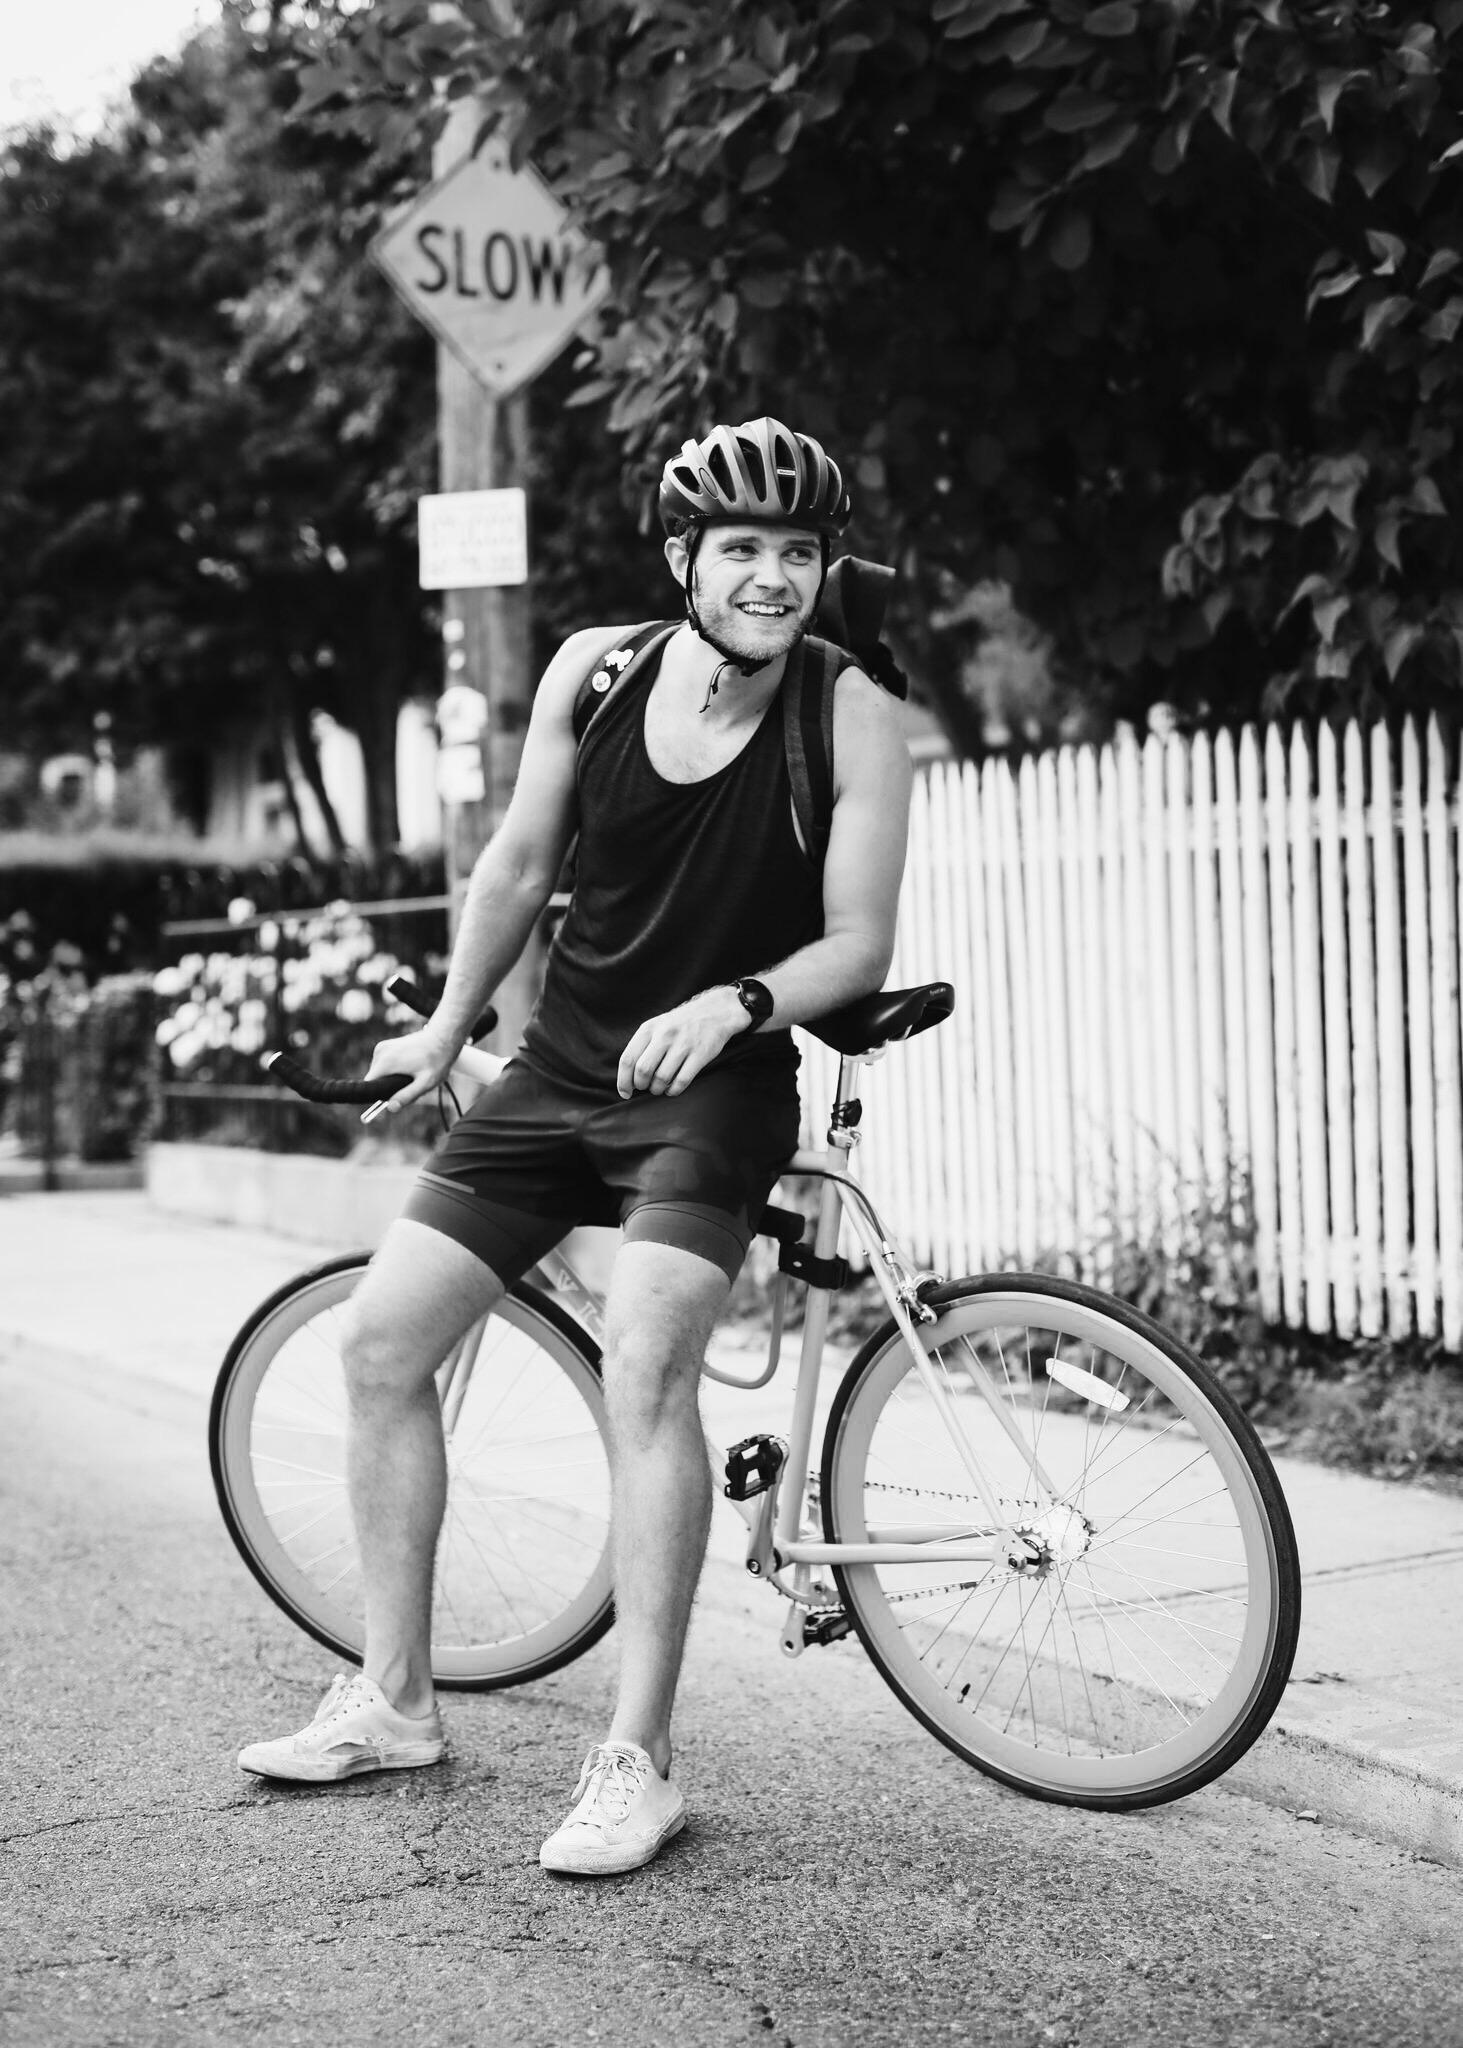 Aadm Outdoor Bike - Nicole Brianne.JPG